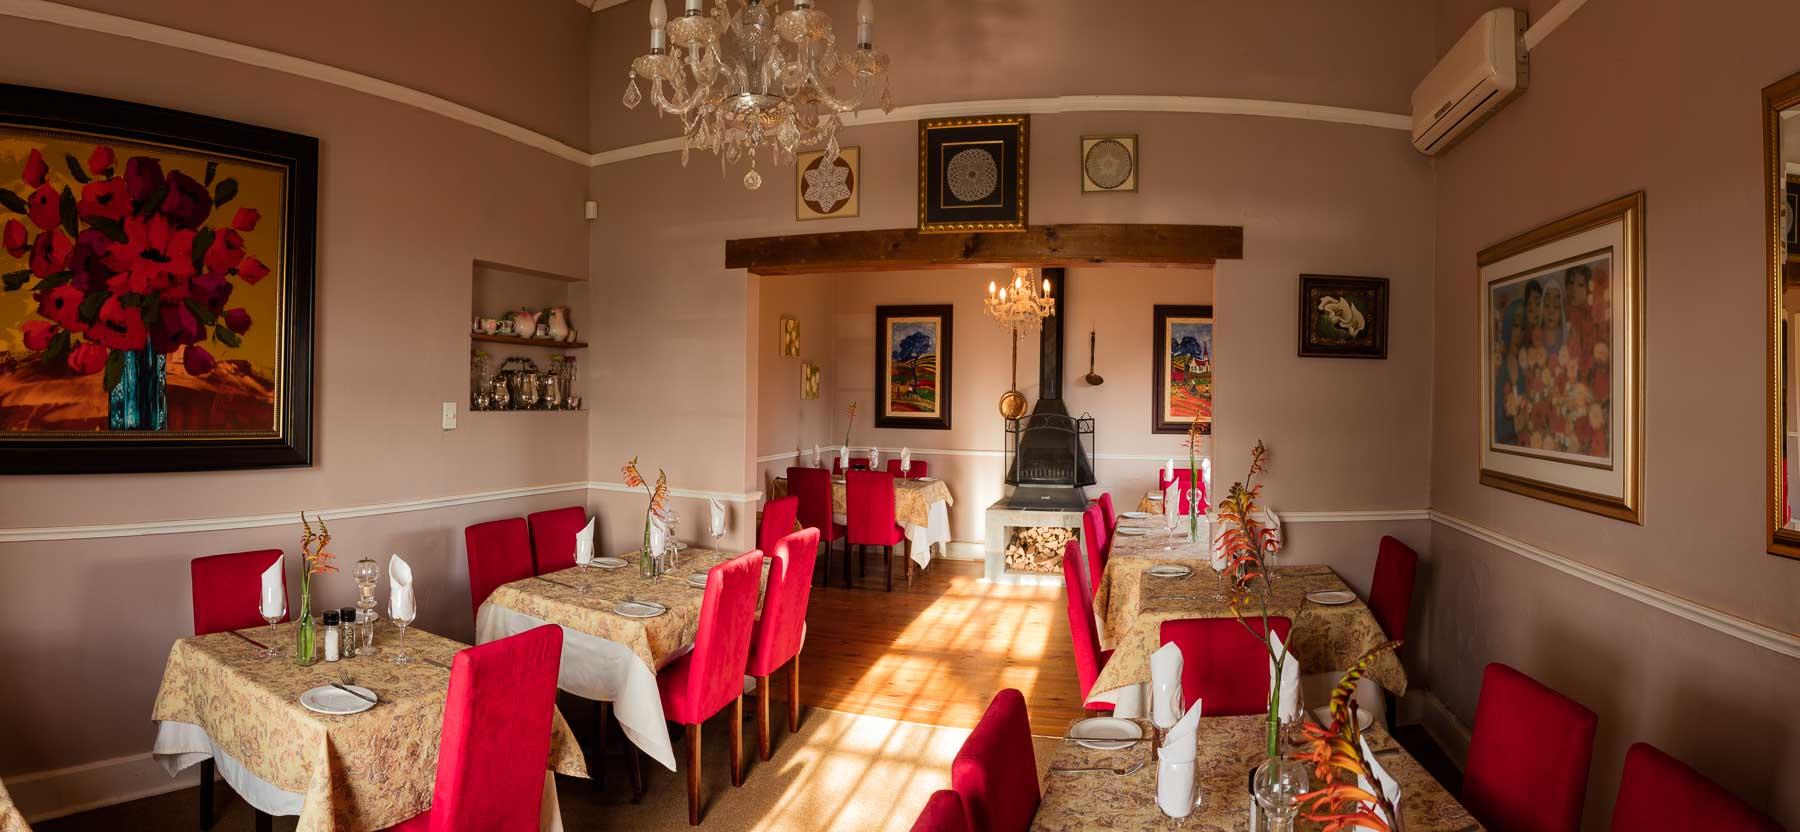 The Old Dalby Restaurant via Facebook